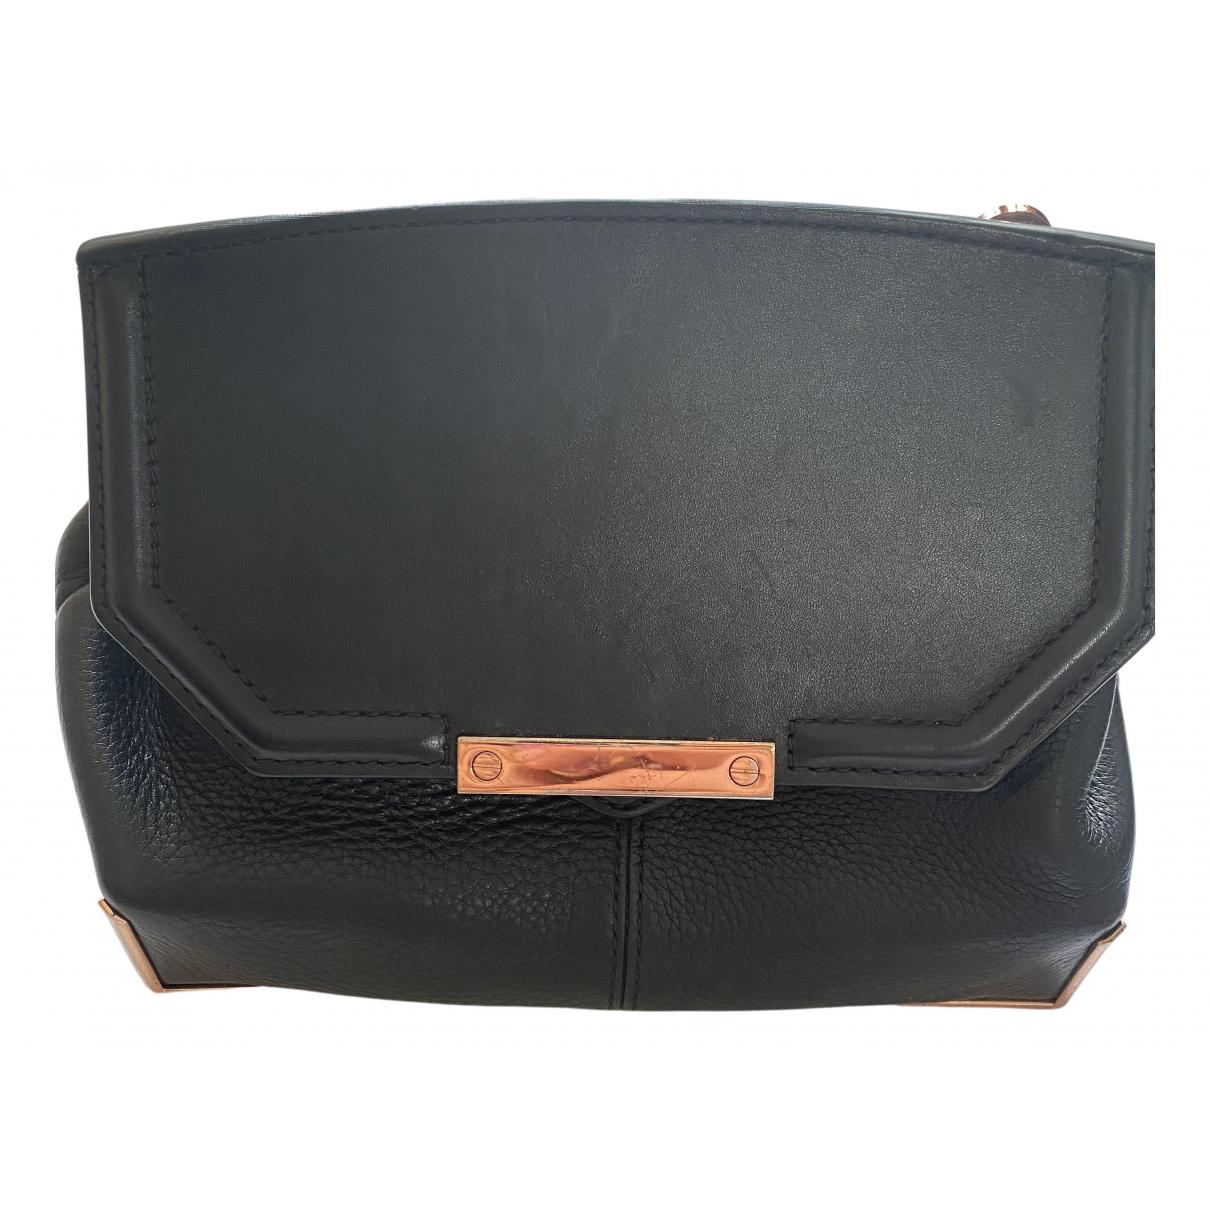 Alexander Wang Prisma Black Leather handbag for Women N